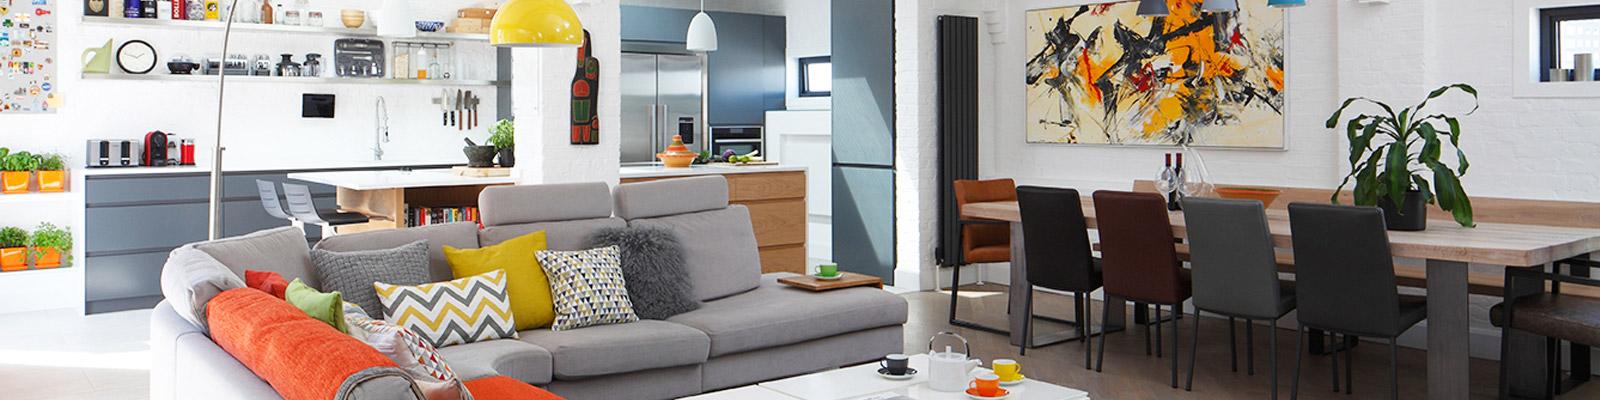 Ensoul Flat Apartment Steel Girders Open Plan Kitchen Diner Sitting Room